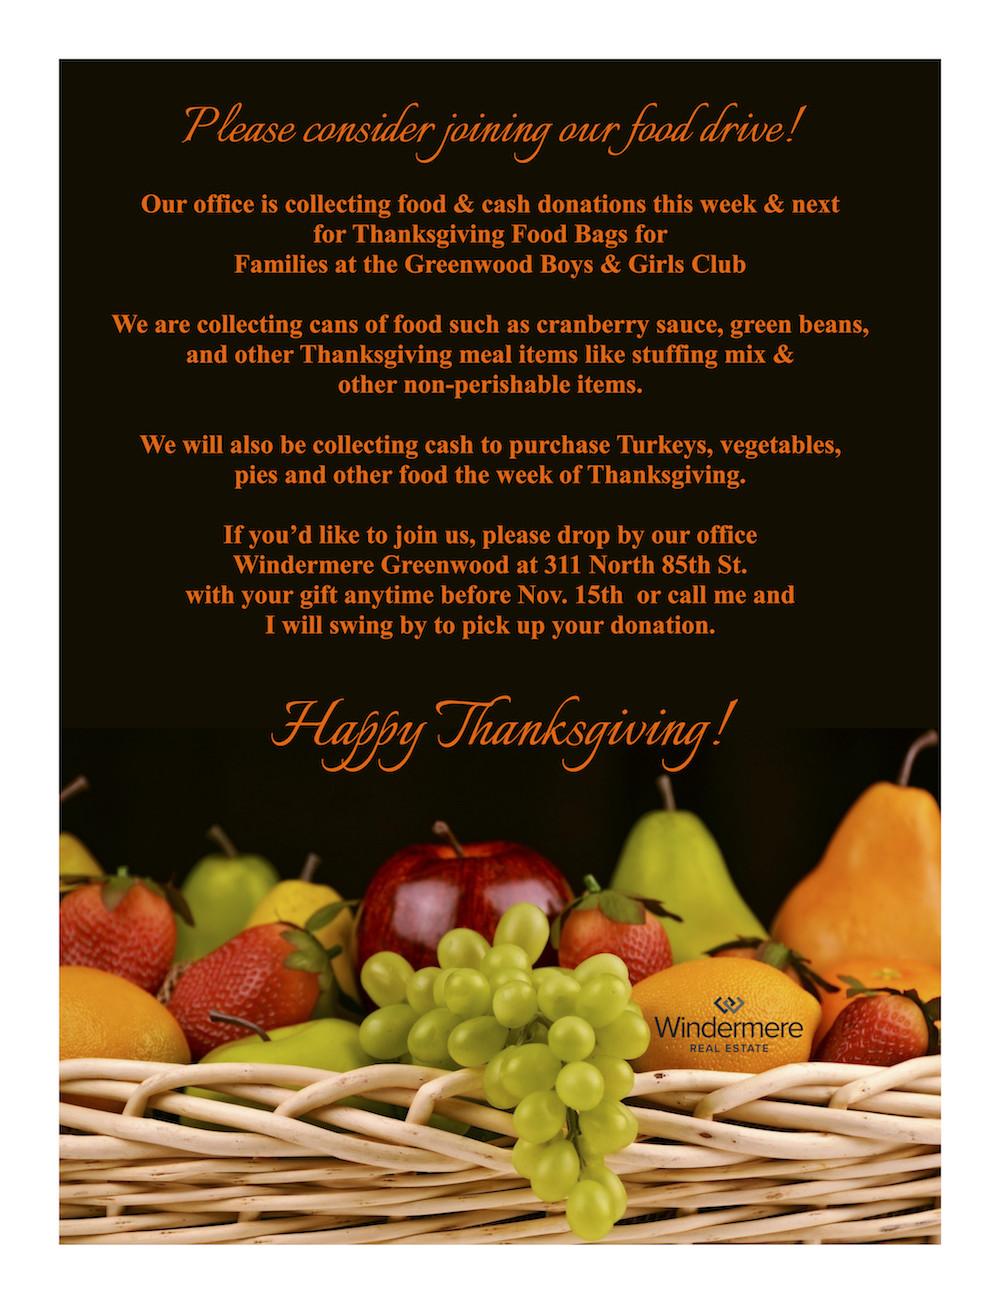 Vons Thanksgiving Dinner 2019  Thanksgiving Meals Windermere Greenwood